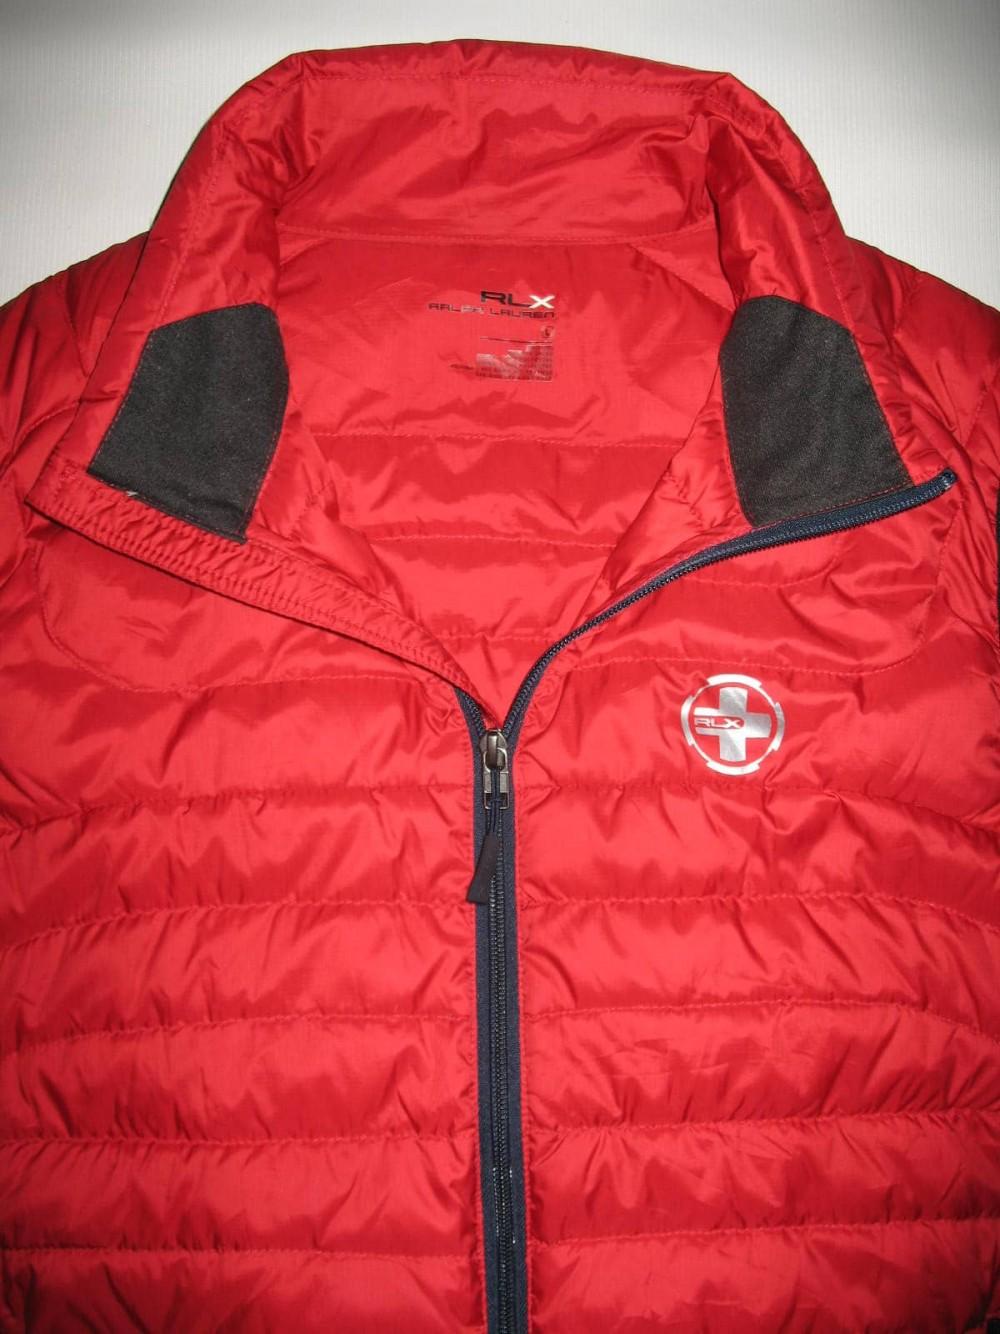 Жилет RLX RALPH LAUREN  down vest (размер L) - 3